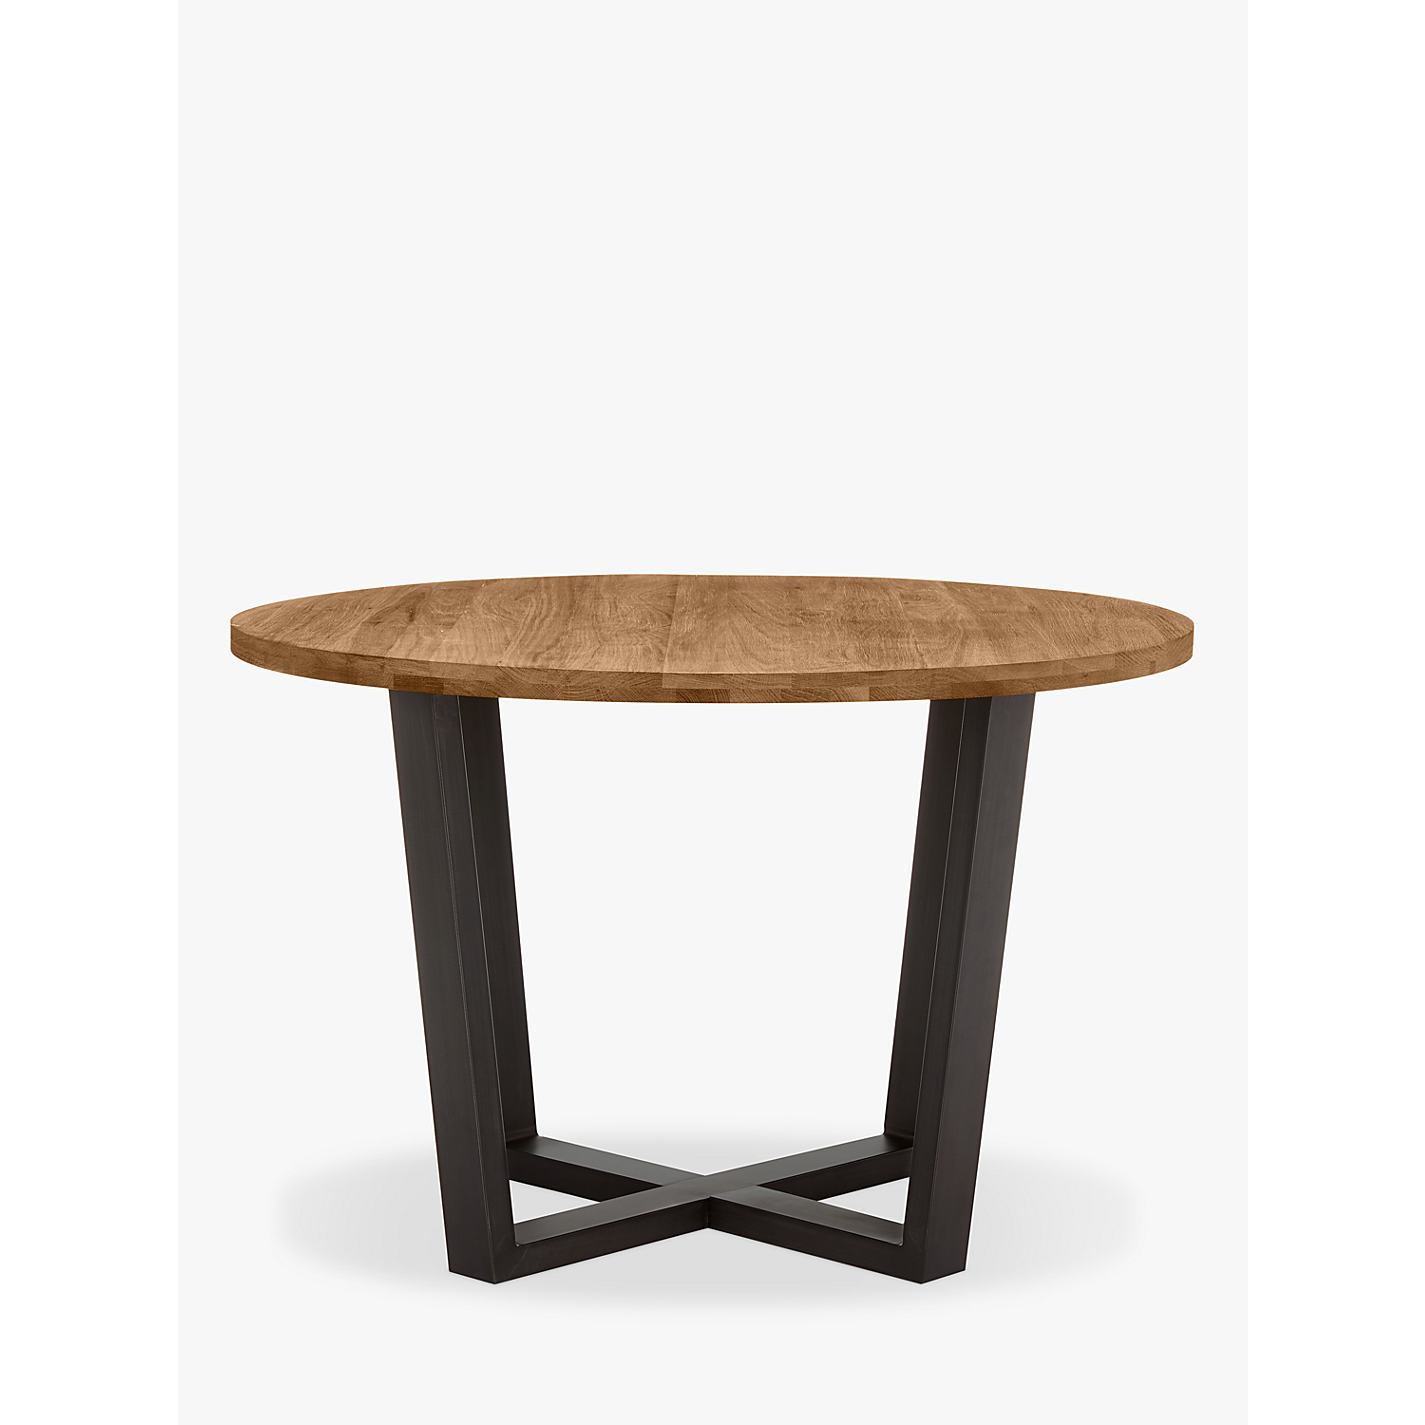 buy john lewis calia round 6 seater dining table online at johnlewiscom - Round 6 Seater Dining Table